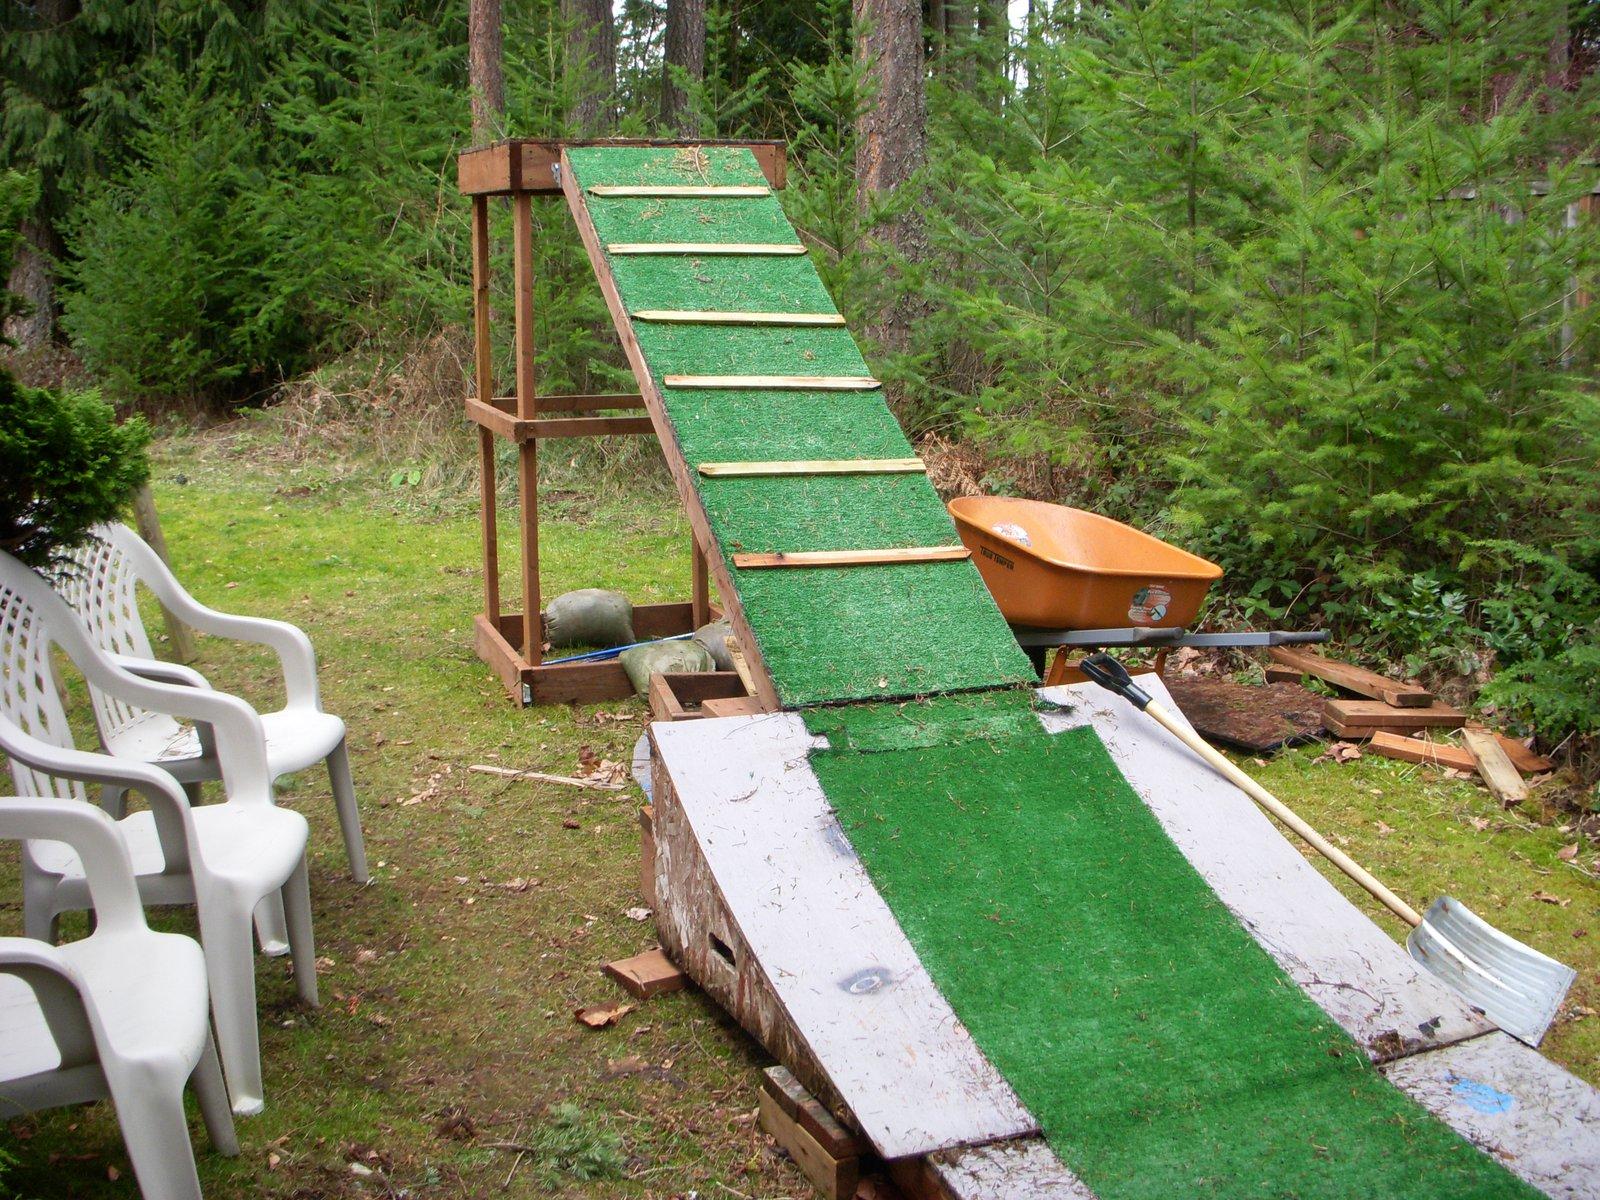 Backyard Setup Drop-in